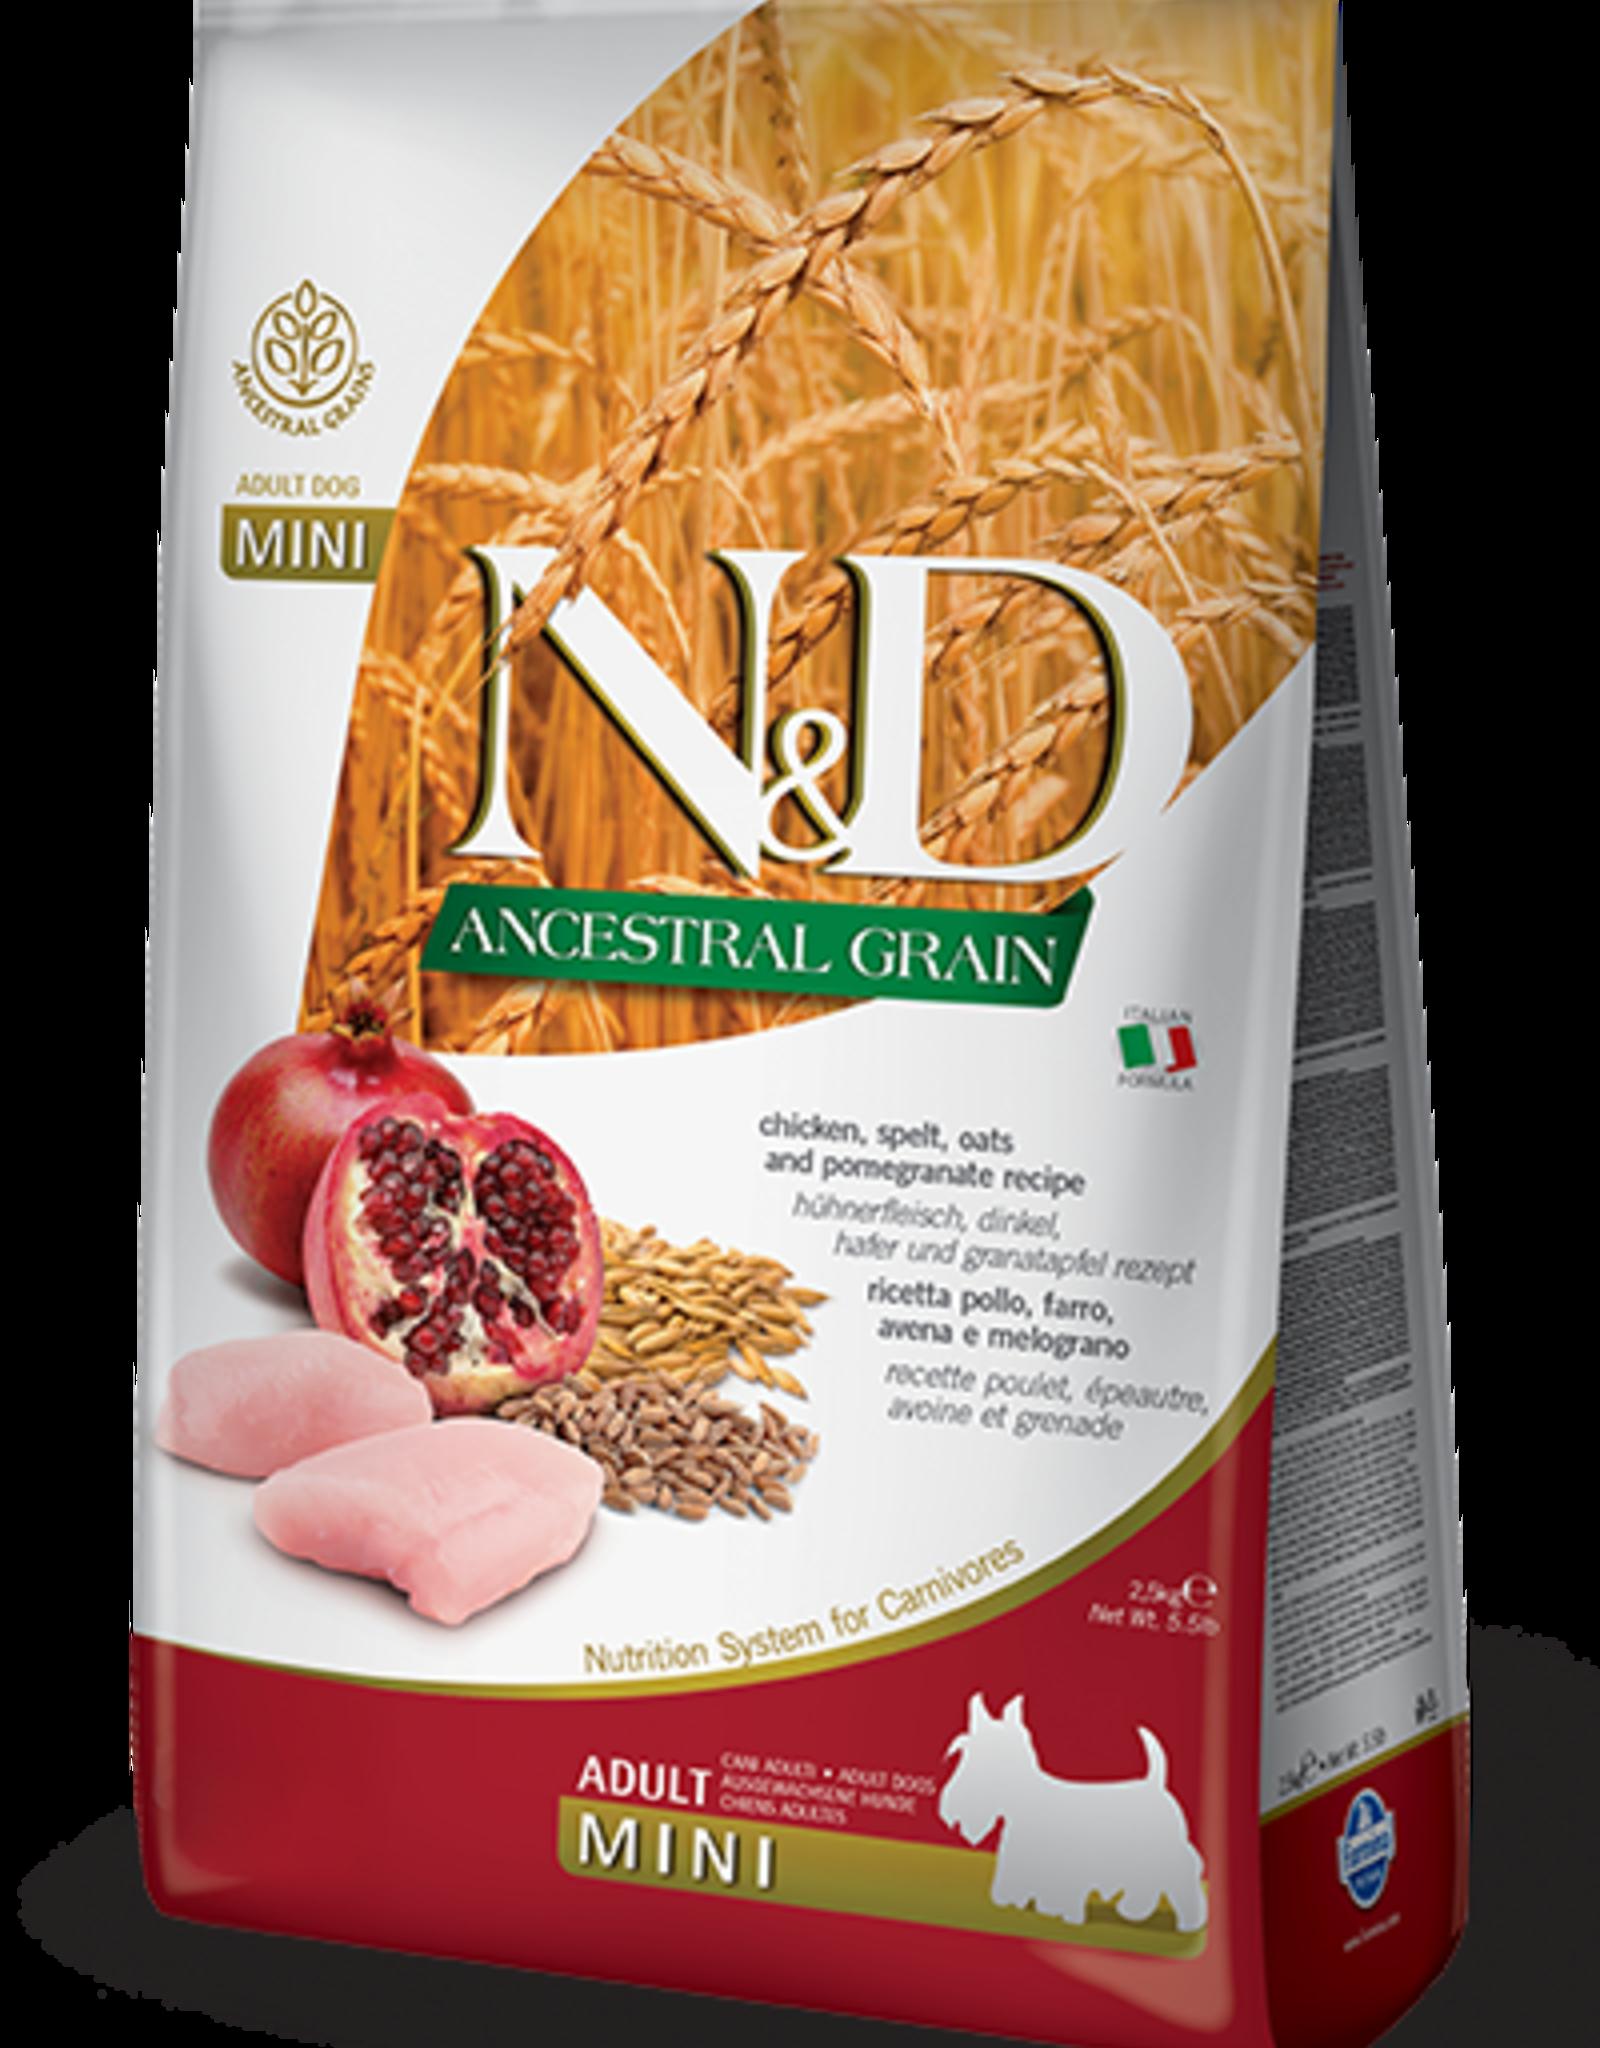 Farmina Farmina Ancestral Grain | Chicken, Spelt, Oats & Pomegranate Adult MINI